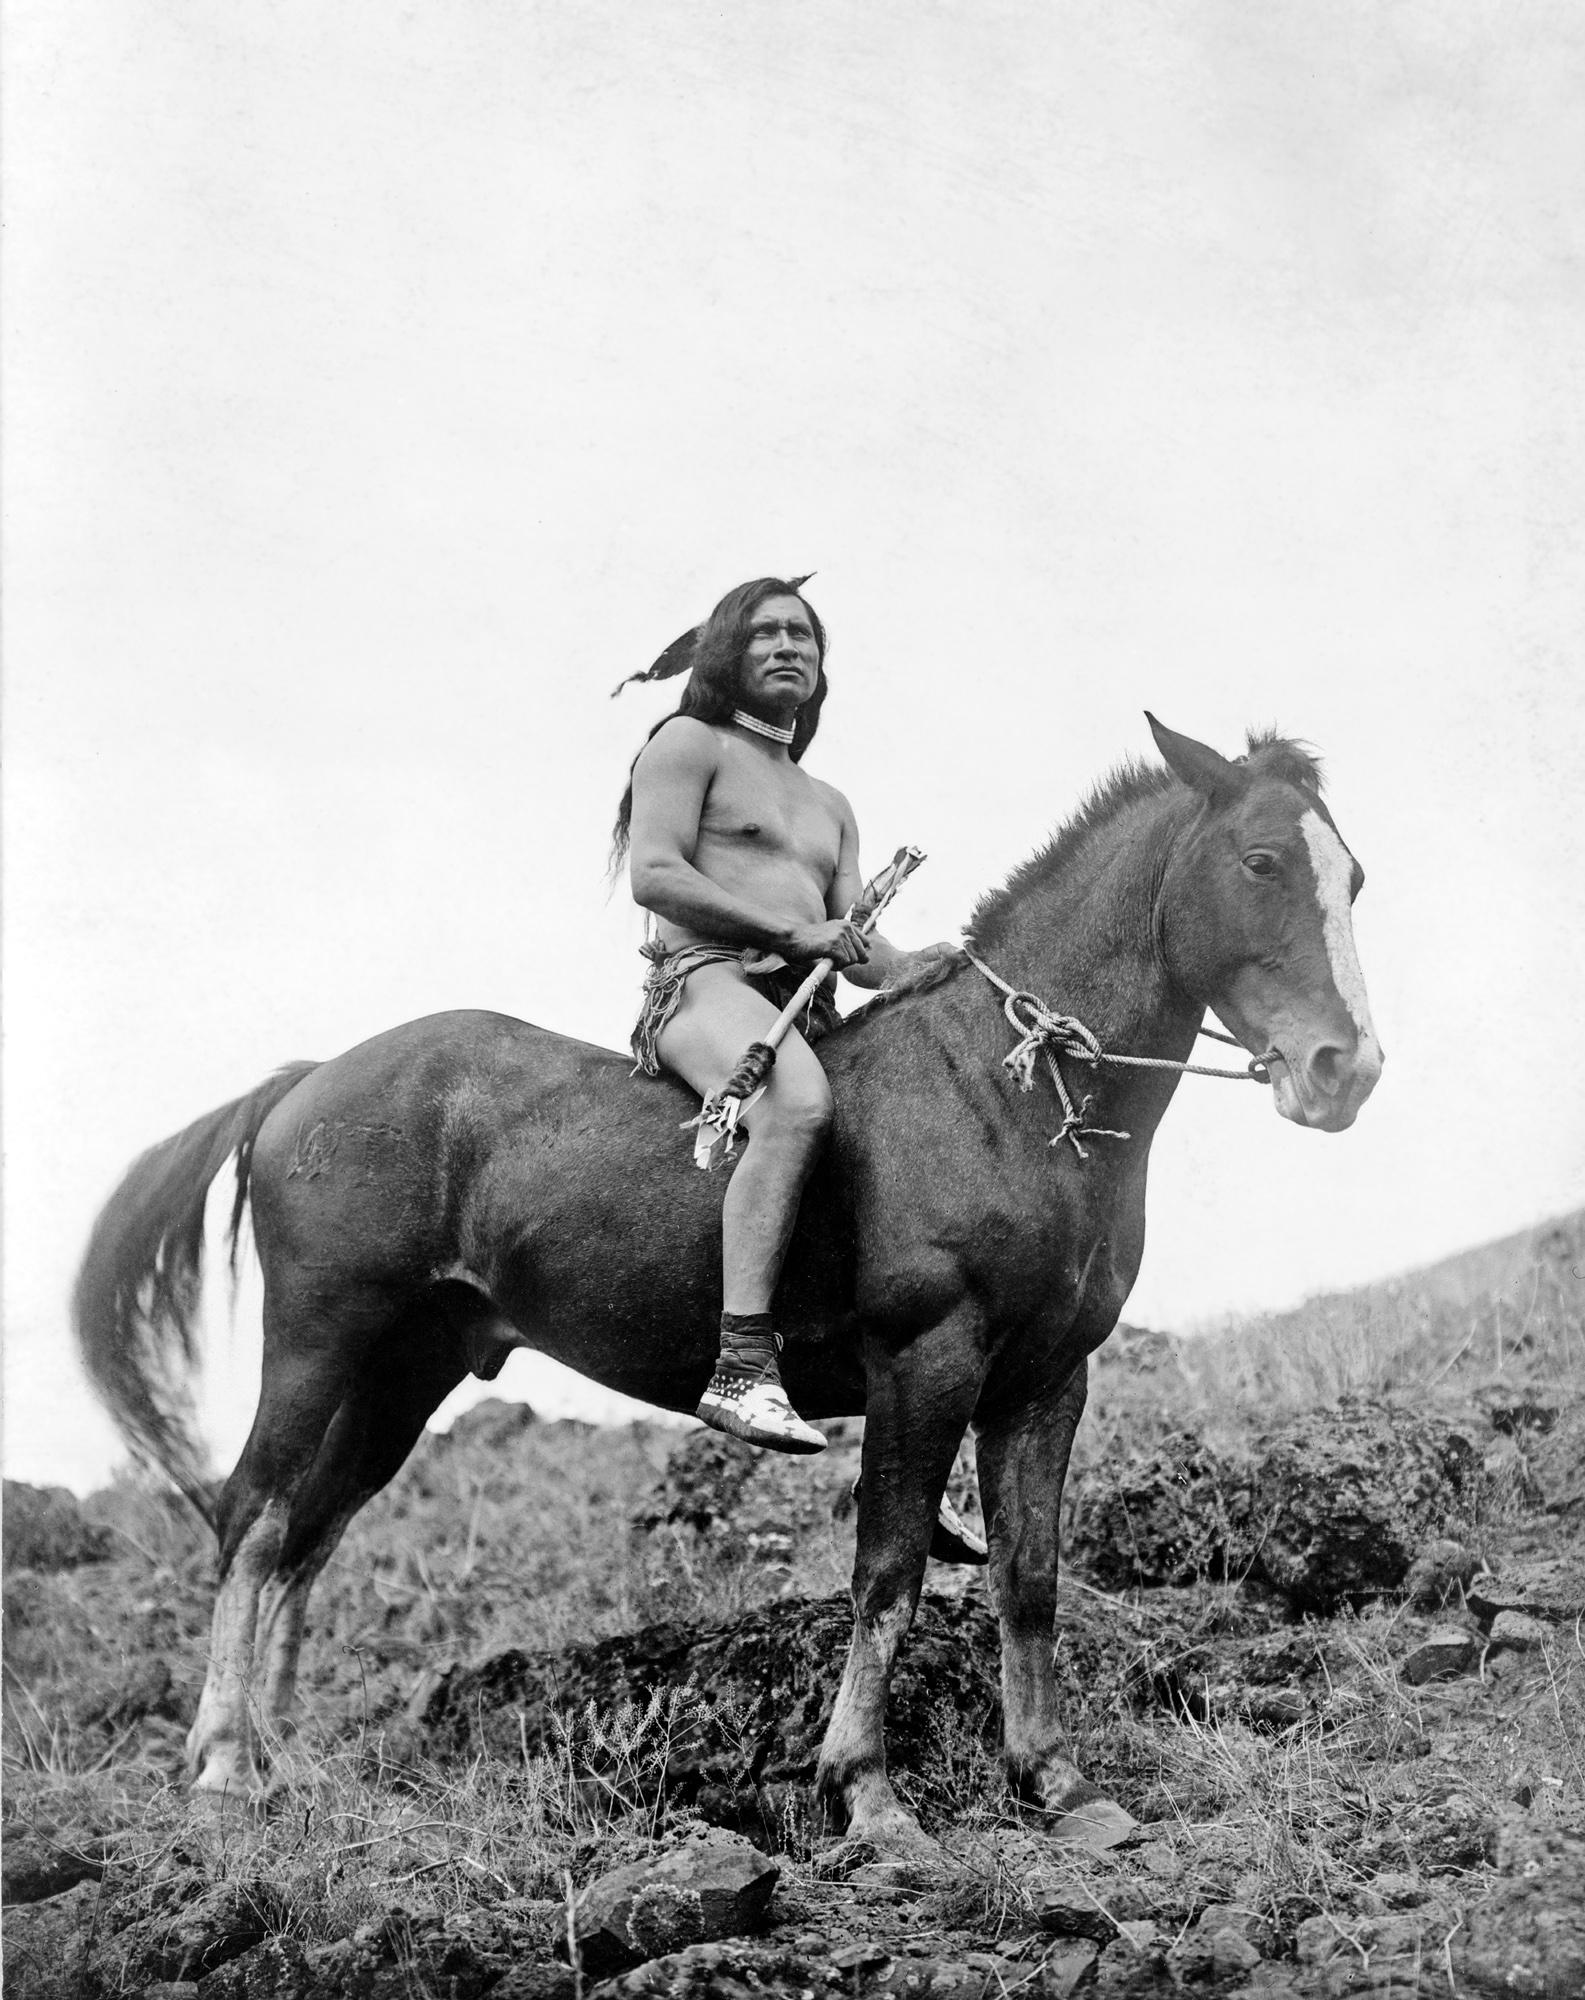 On horse photo 61